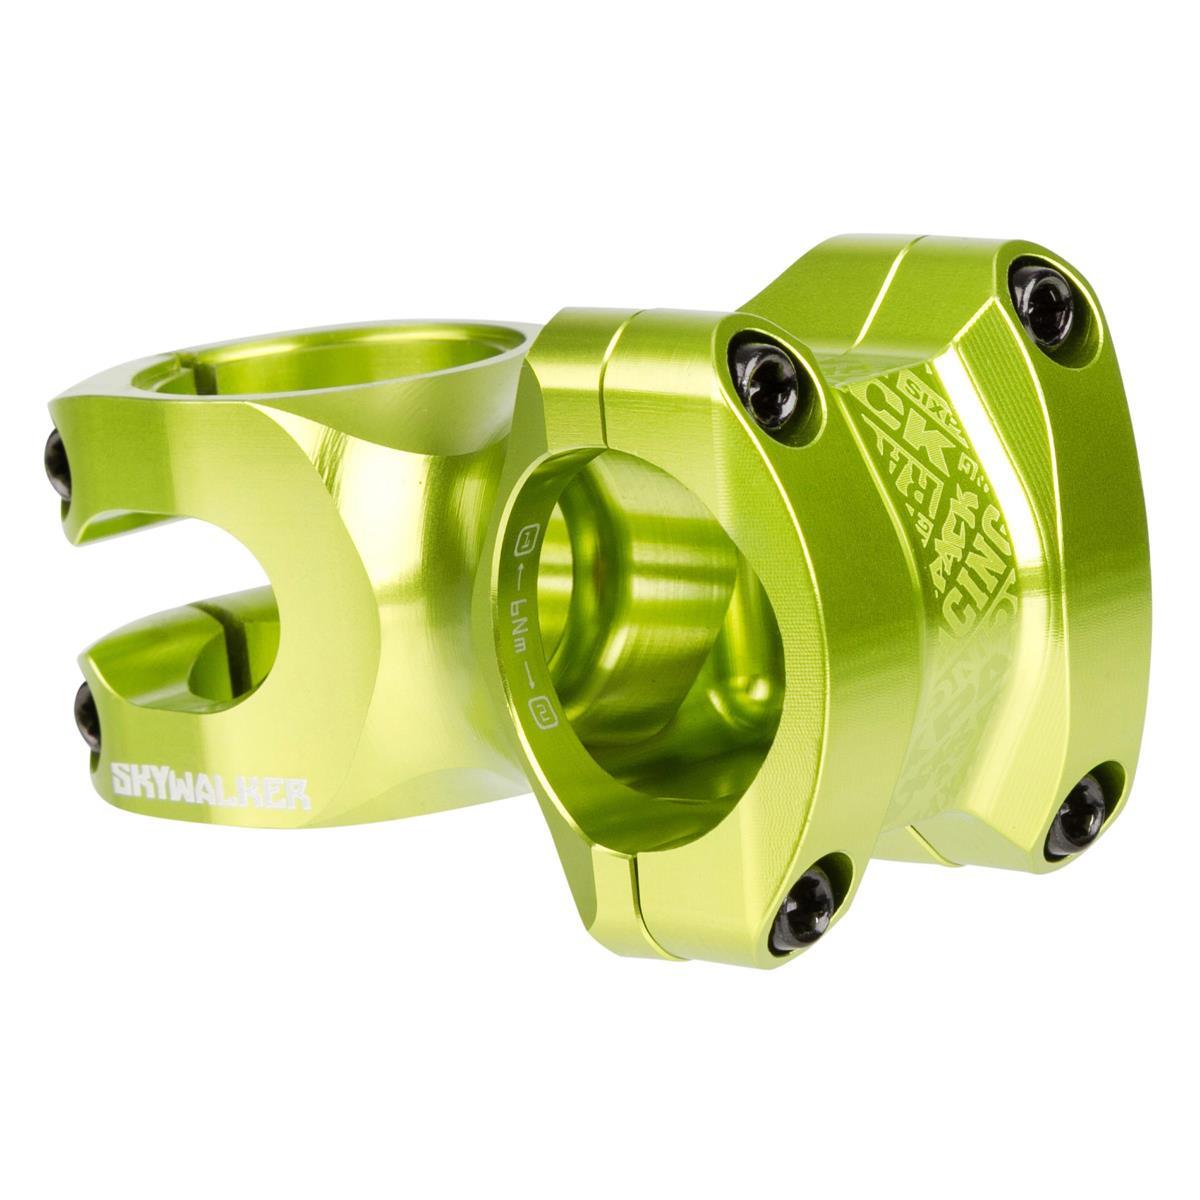 Sixpack MTB-Vorbau Skywalker Electric-Green, 31.8 mm, Vorlauf 50 mm